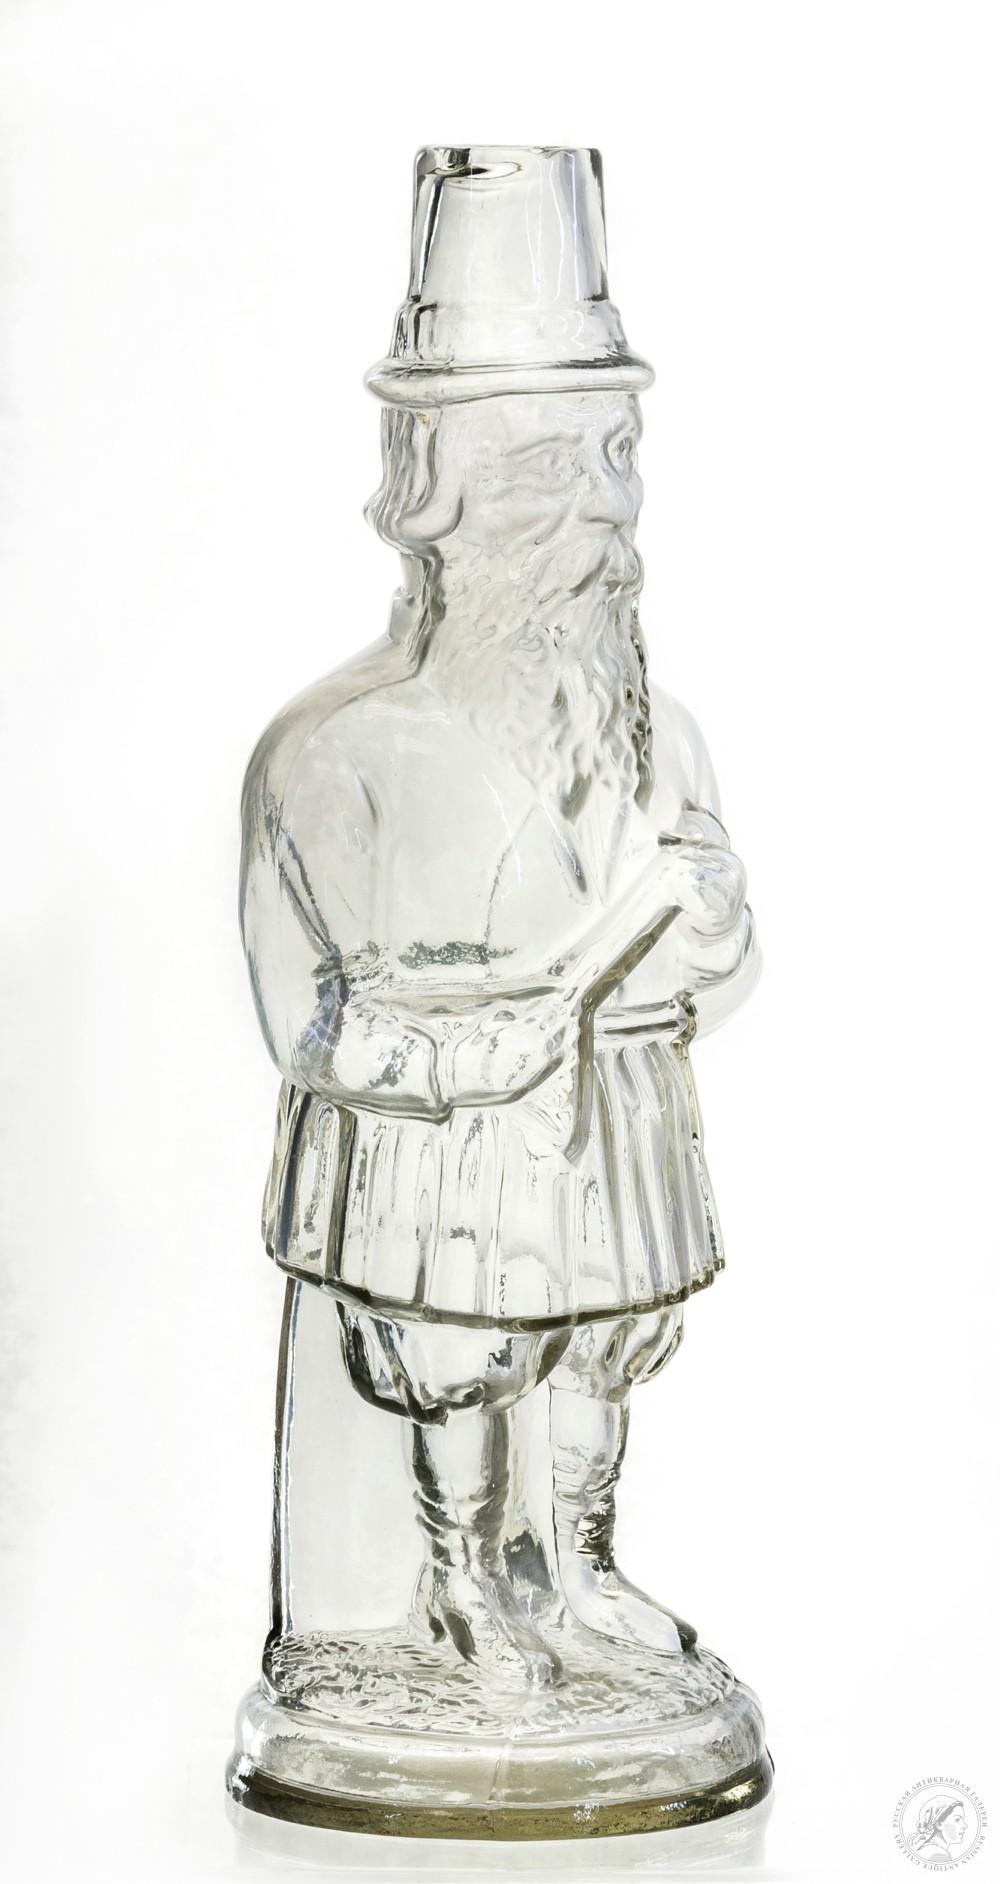 Бутылка фигурная «Балалаечник»